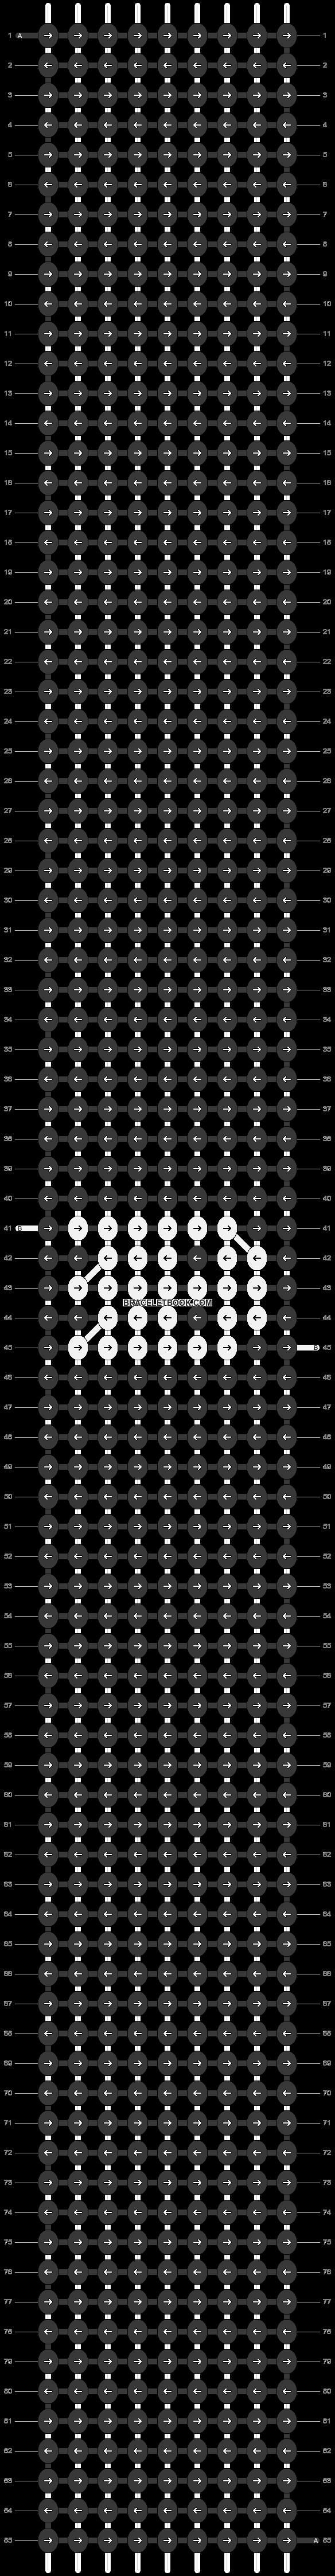 Alpha pattern #103149 pattern